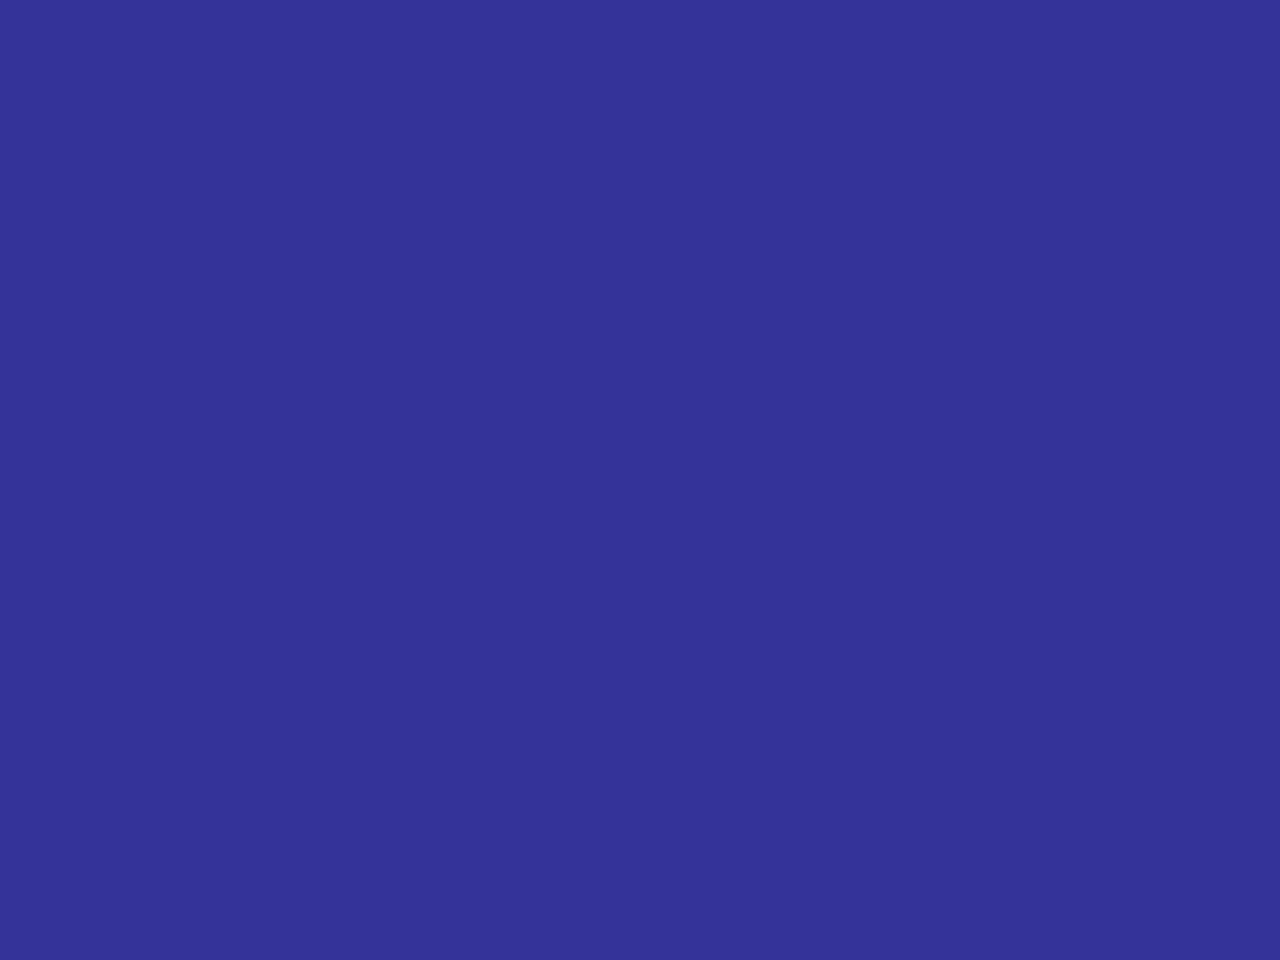 1280x960 Blue Pigment Solid Color Background